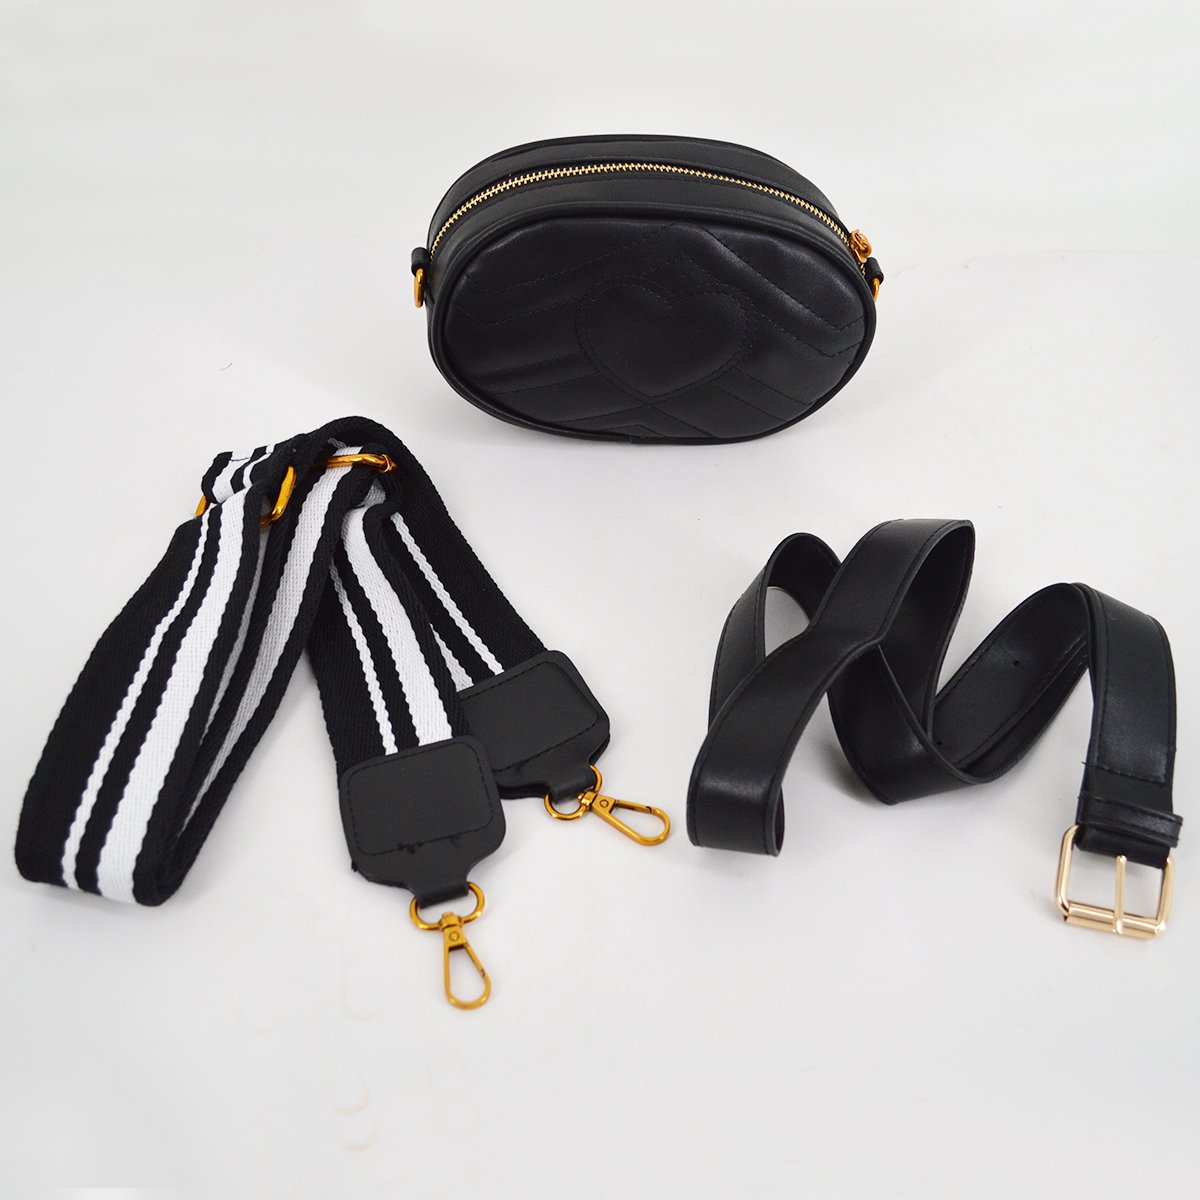 Mily Fashion Women Elegant PU Leather Waist Bag Love Shape Pattern Embroidery Cross Body Bag Fanny Packs by Mily (Image #4)